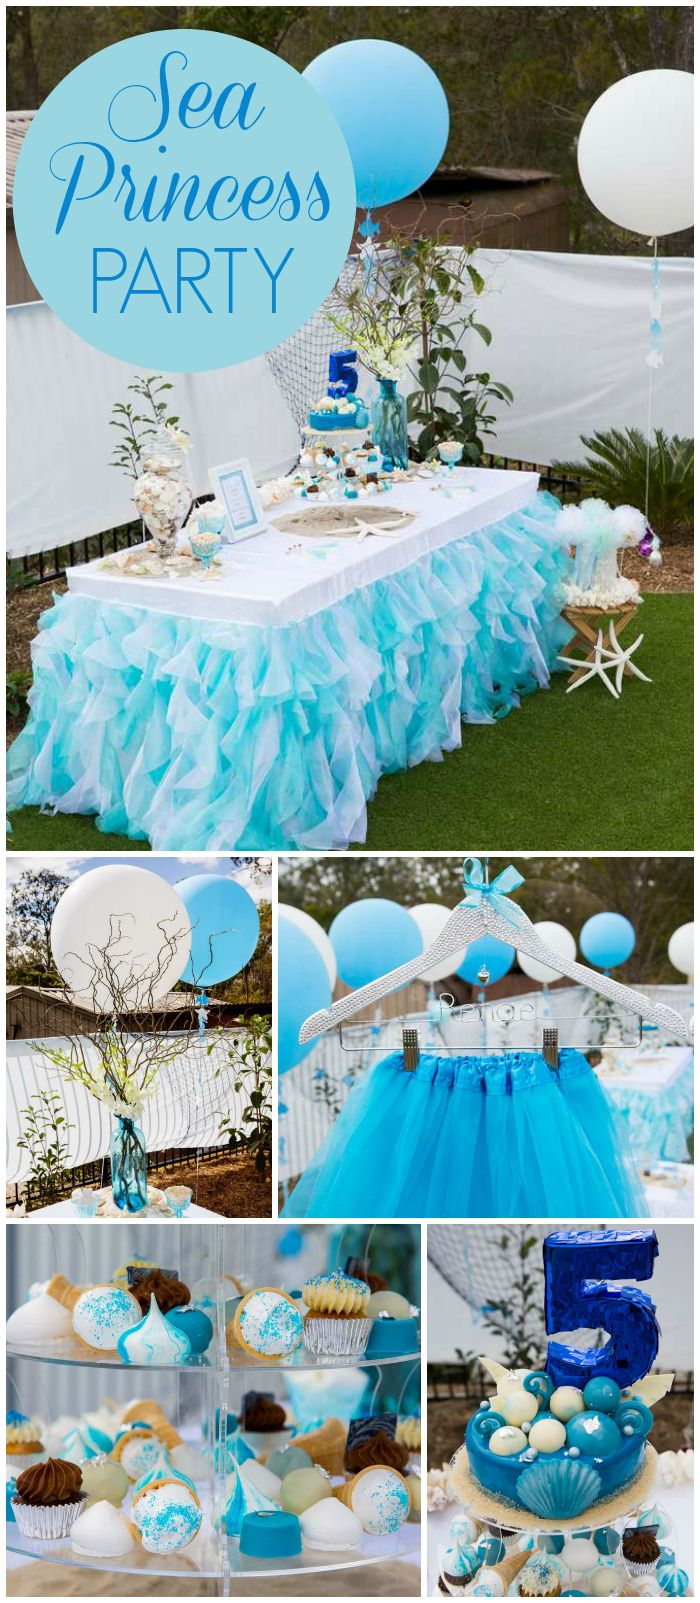 Beach party table decorations sea princess  birthday